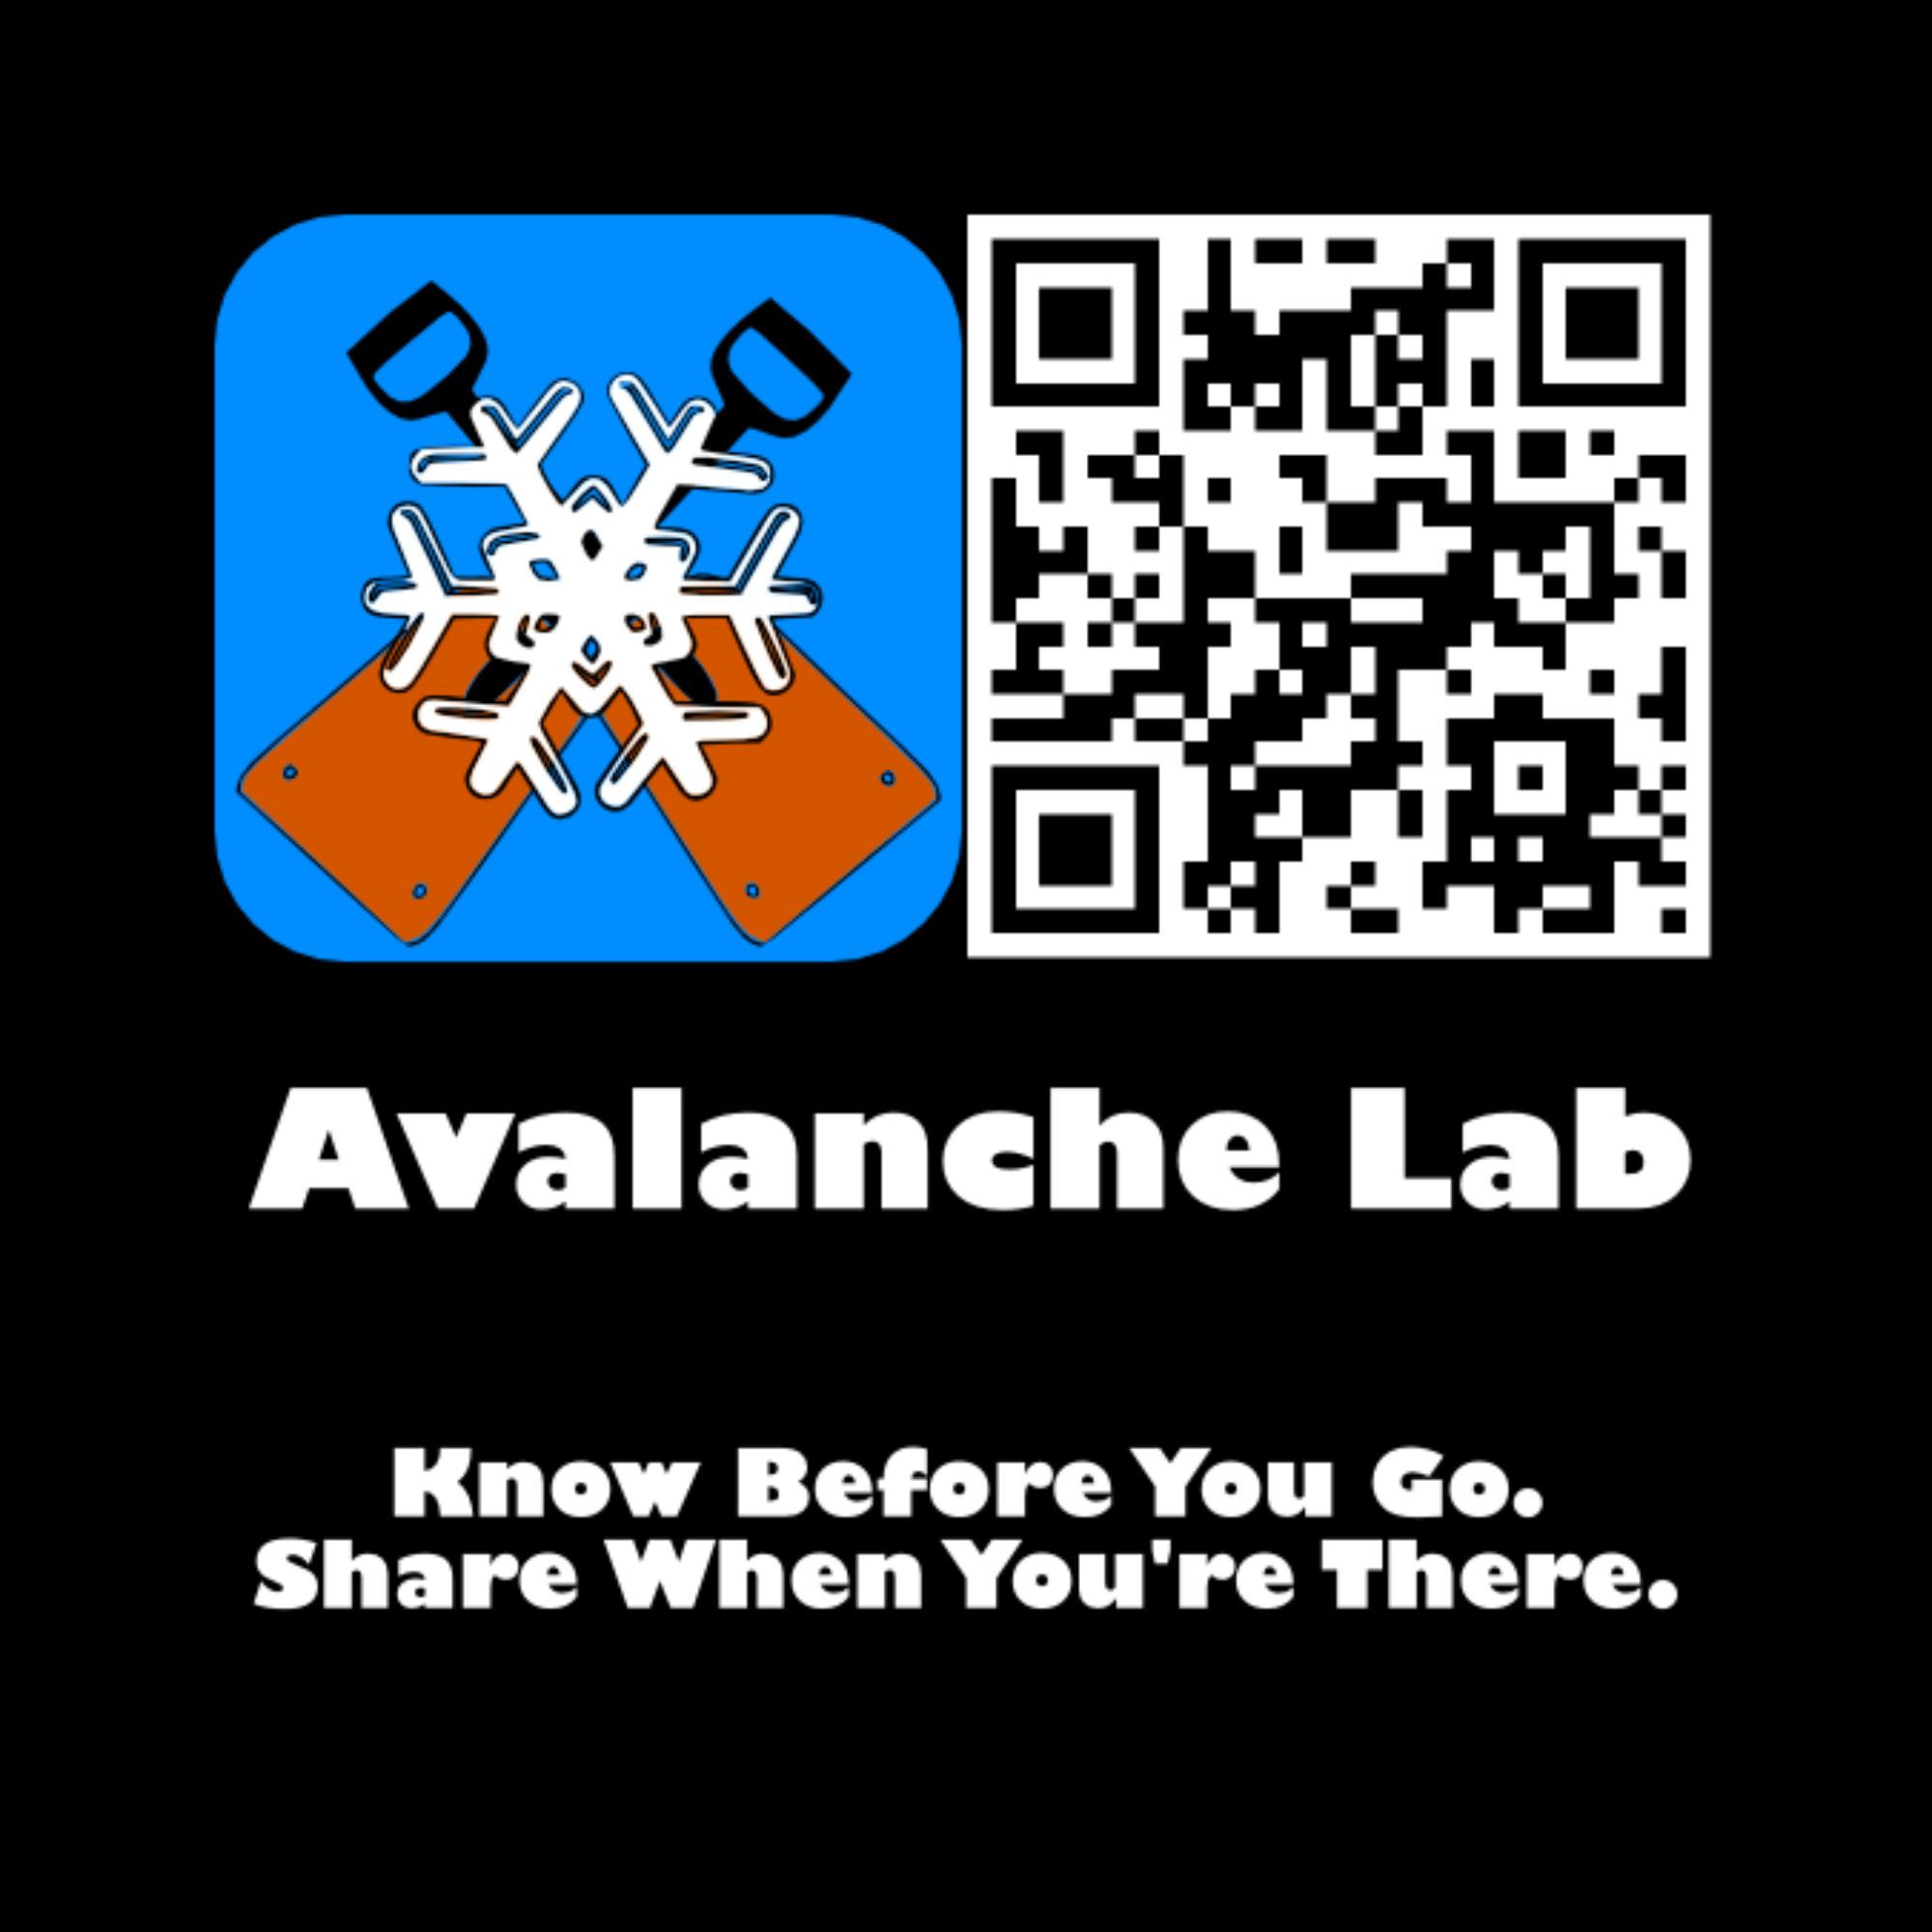 AvalancheLab.org